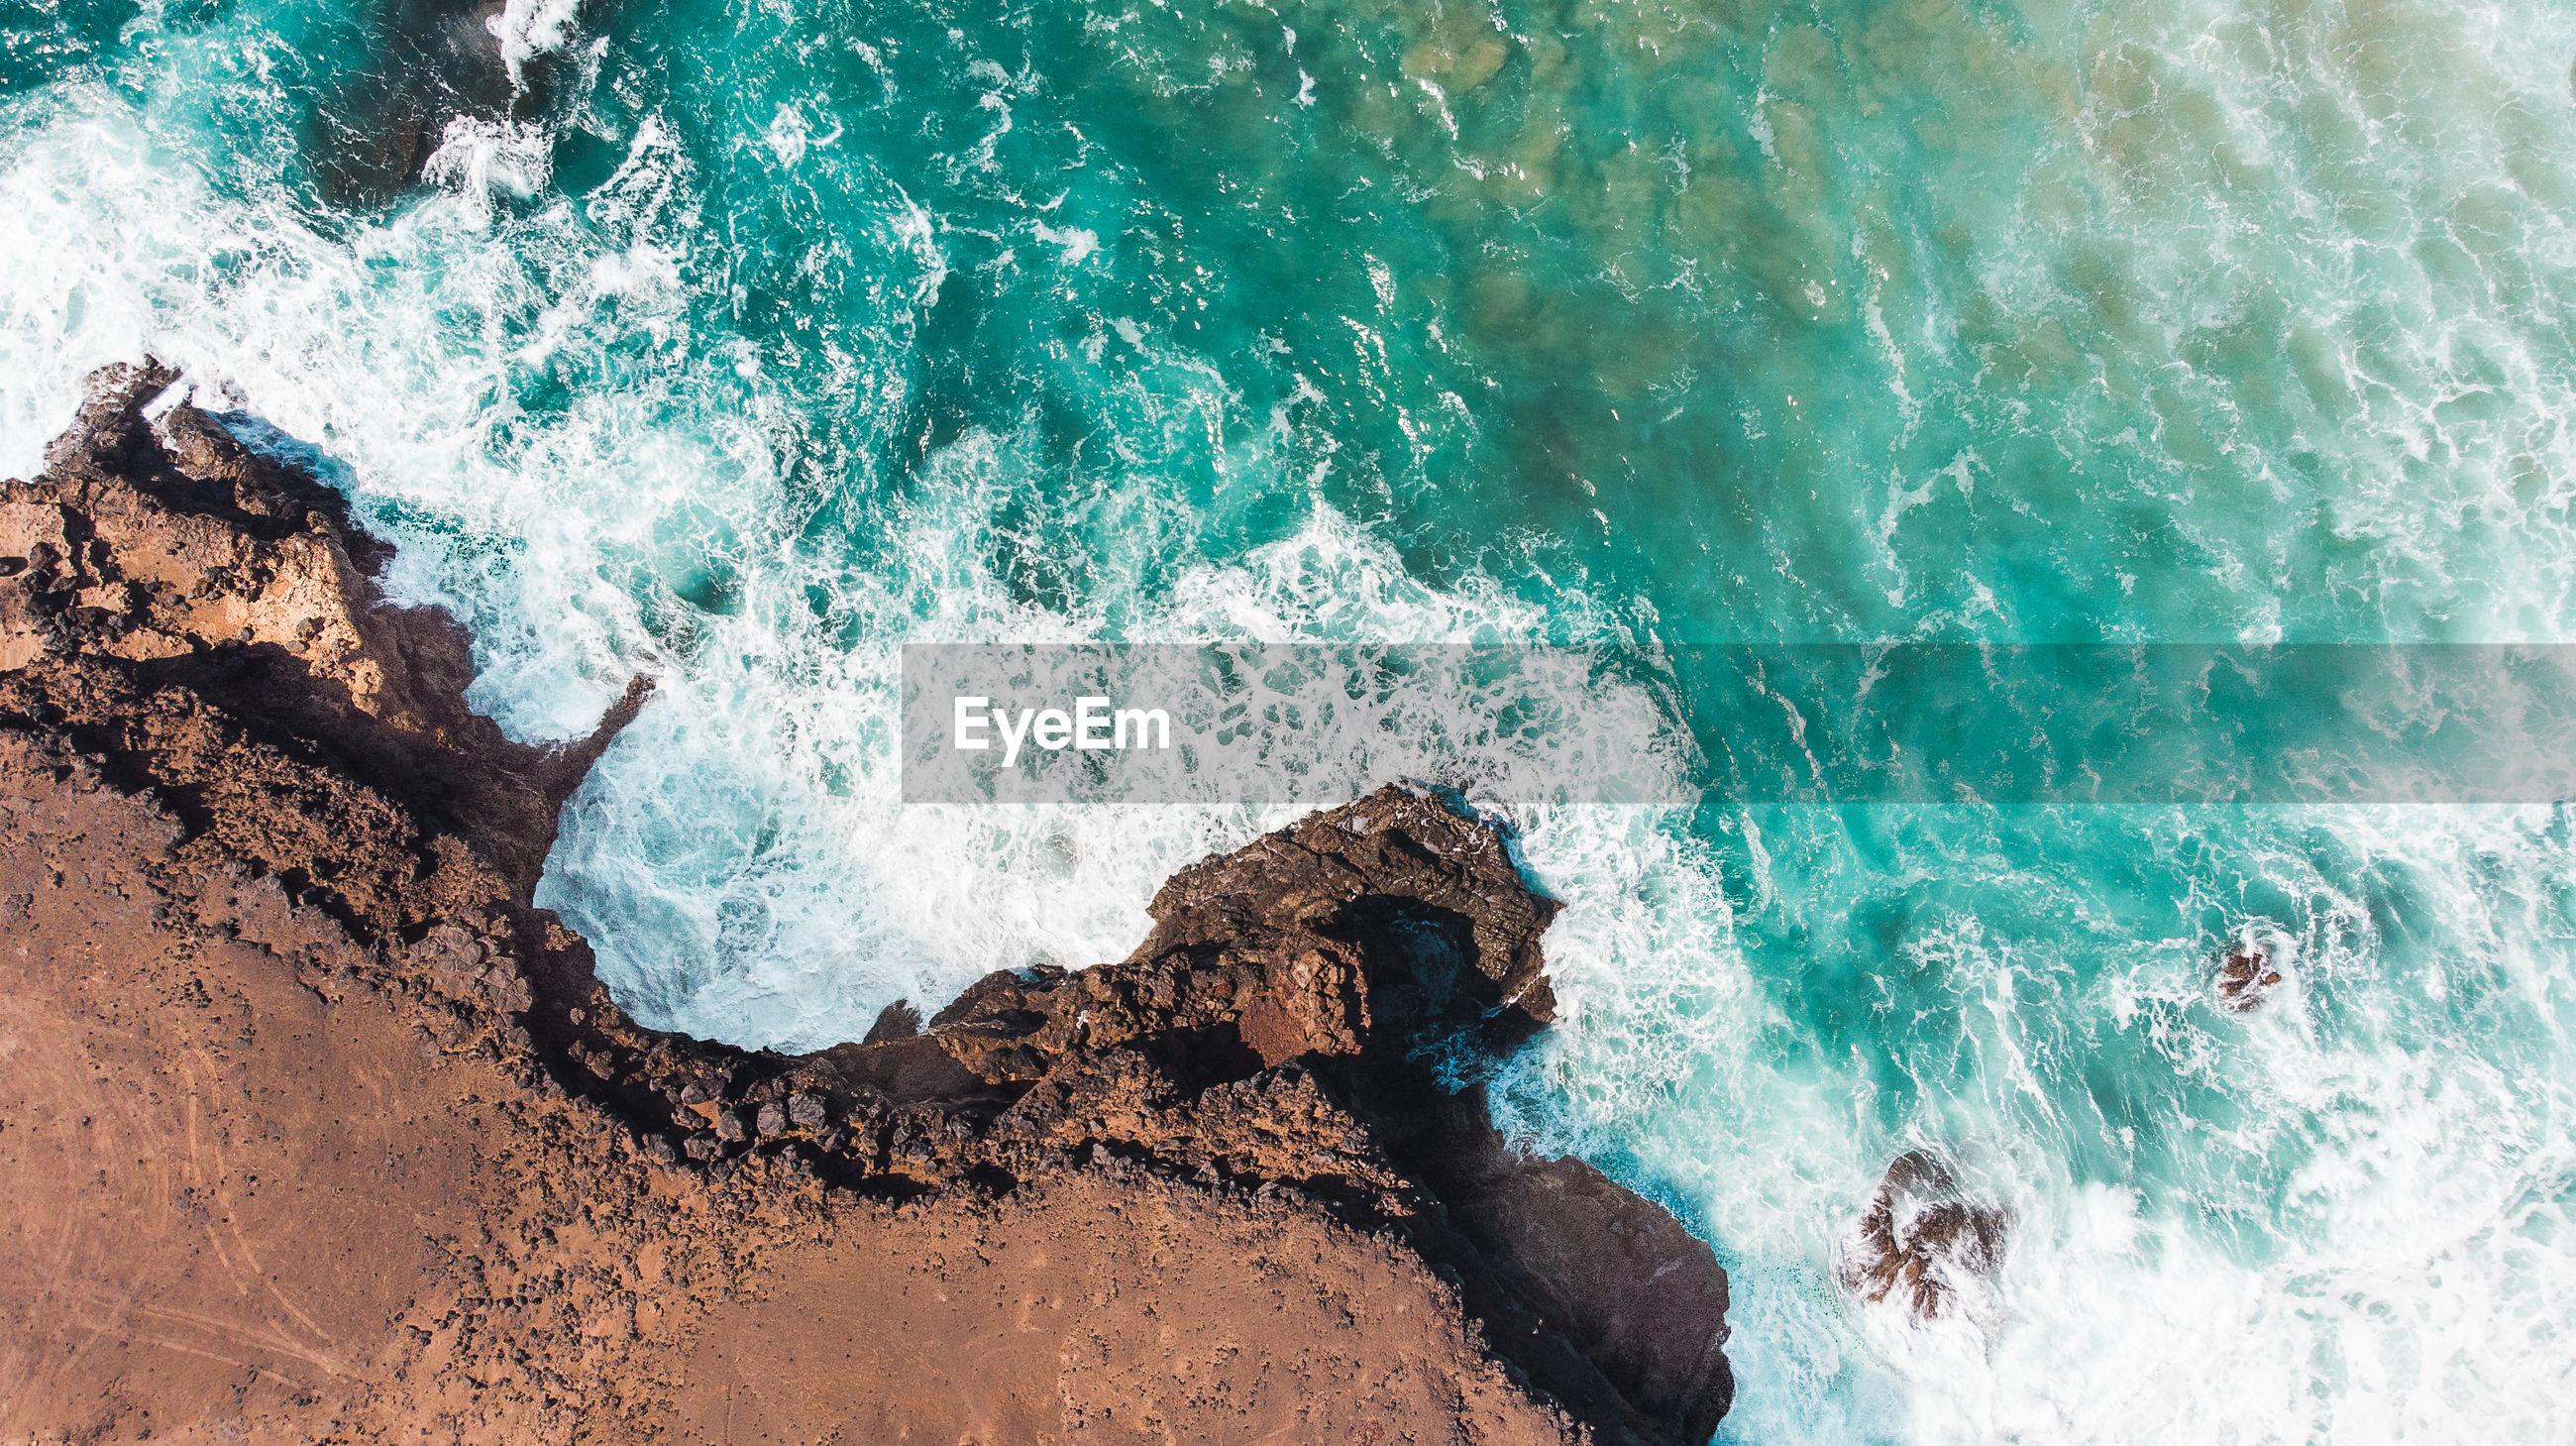 HIGH ANGLE VIEW OF WAVE SPLASHING ON ROCK